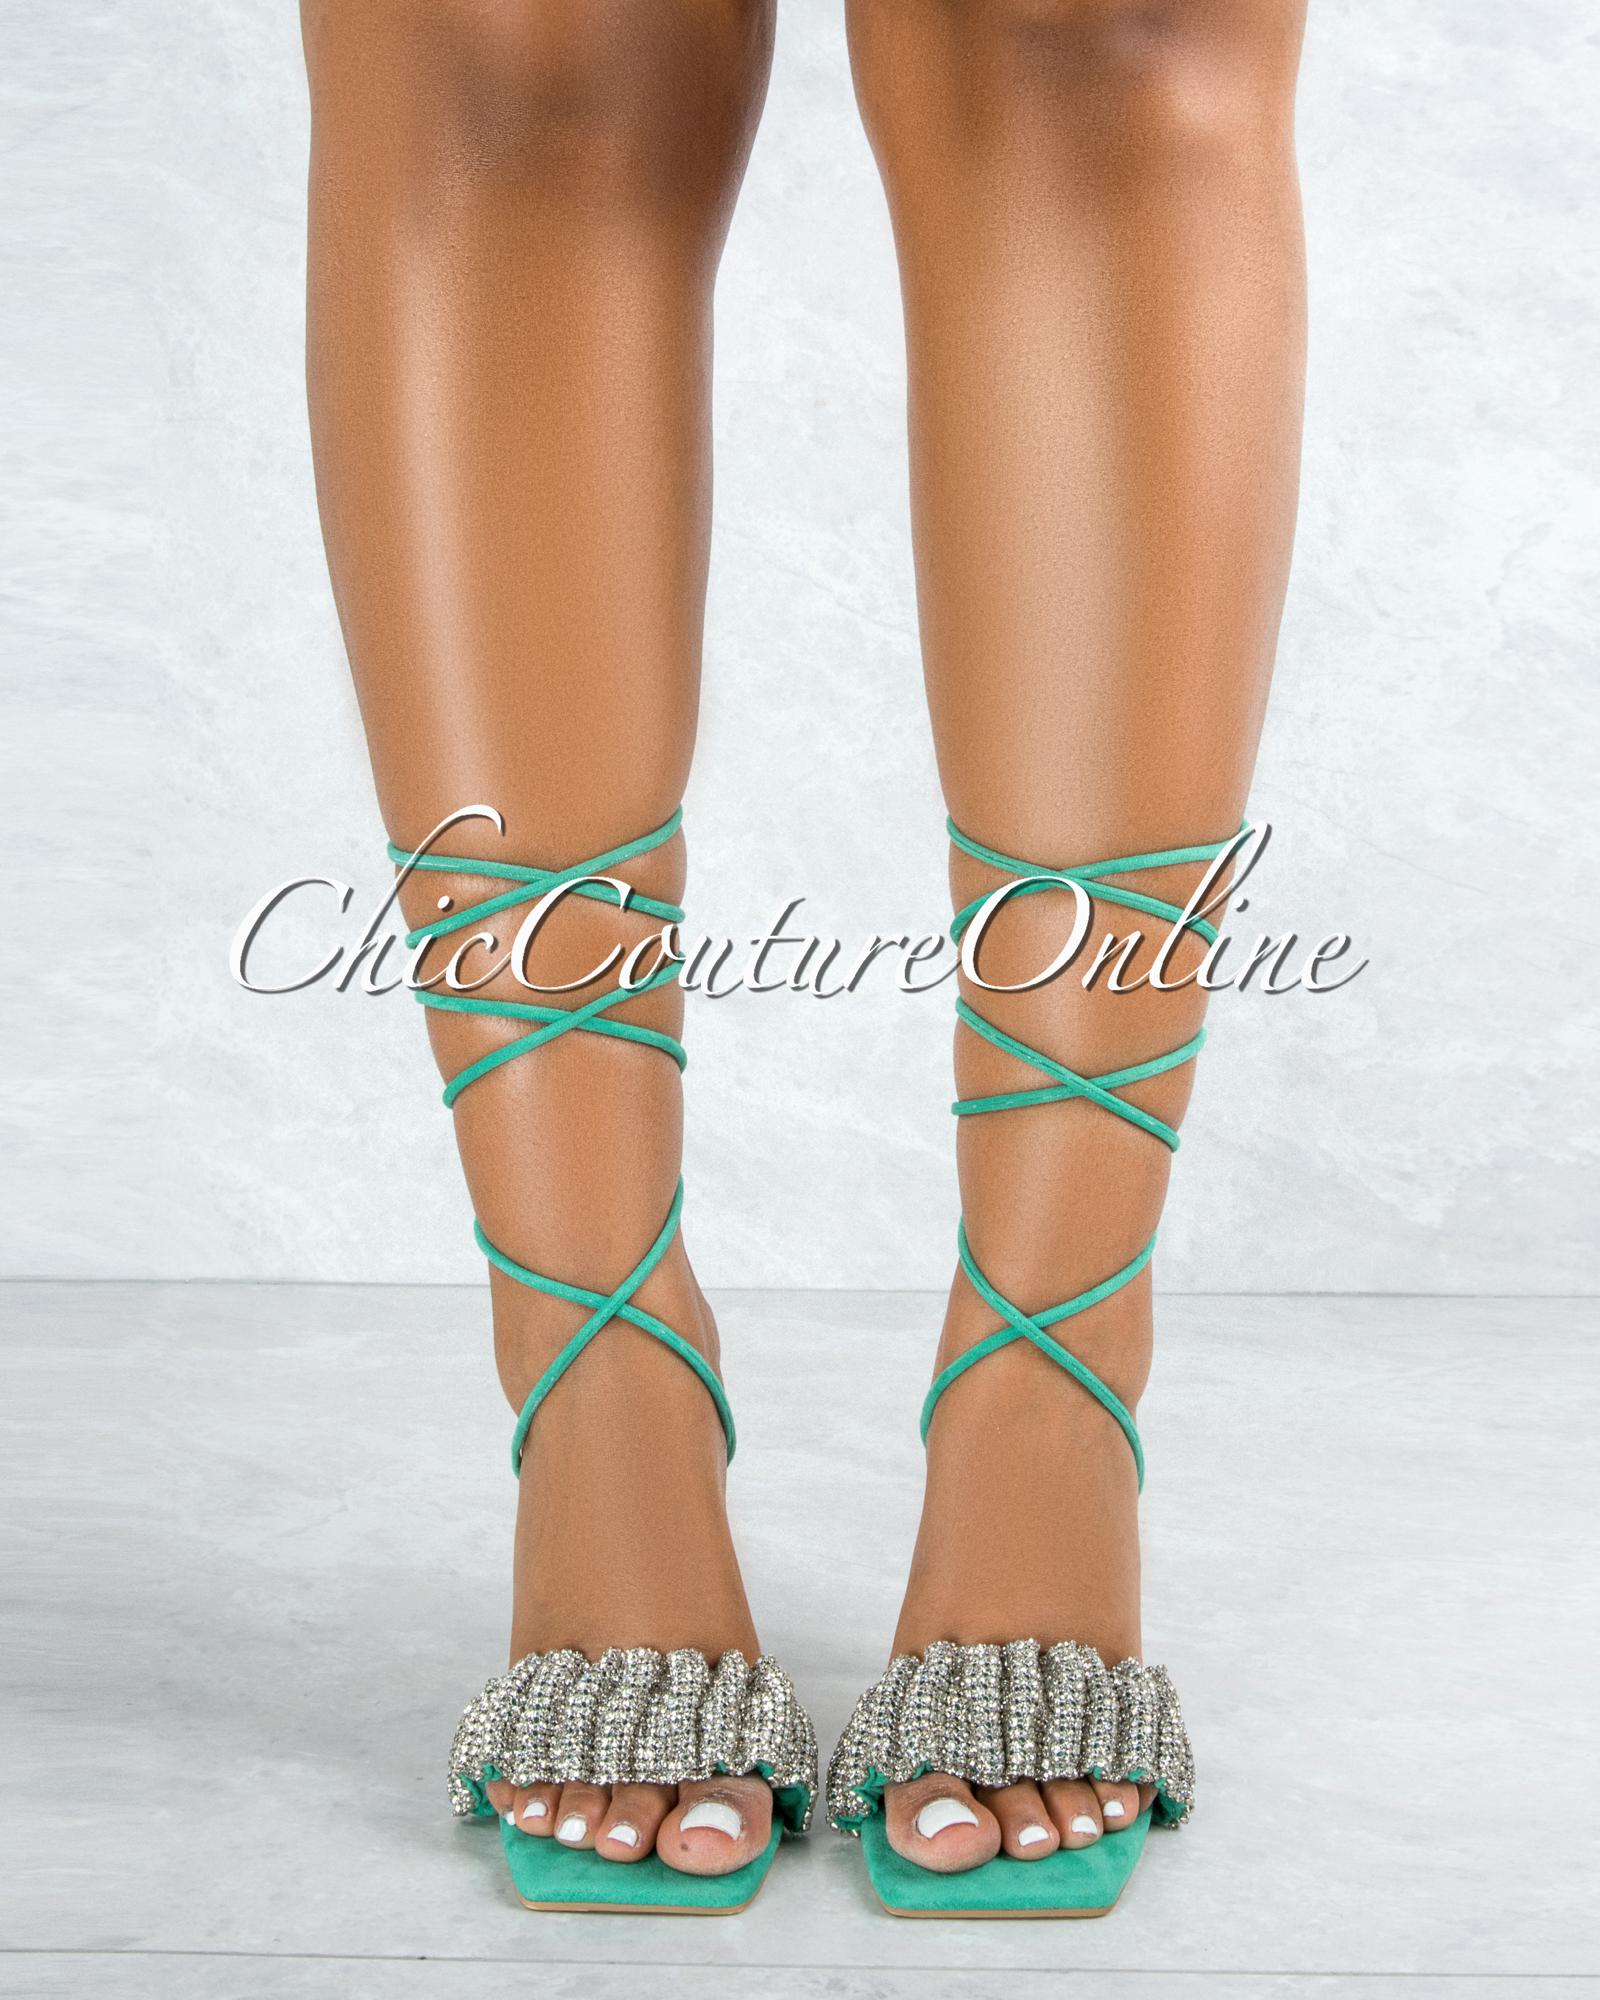 Angel Green Sole Silver Rhinestones Strap Lace-Up Heels